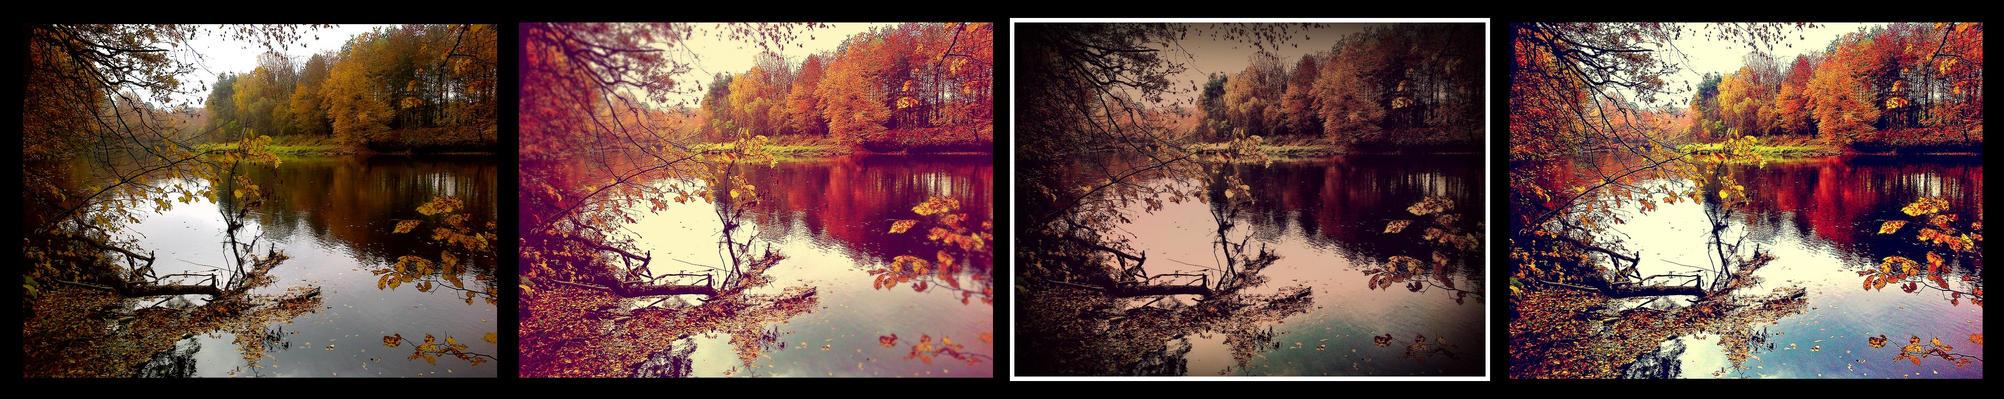 Autumn 4 by Alienixung